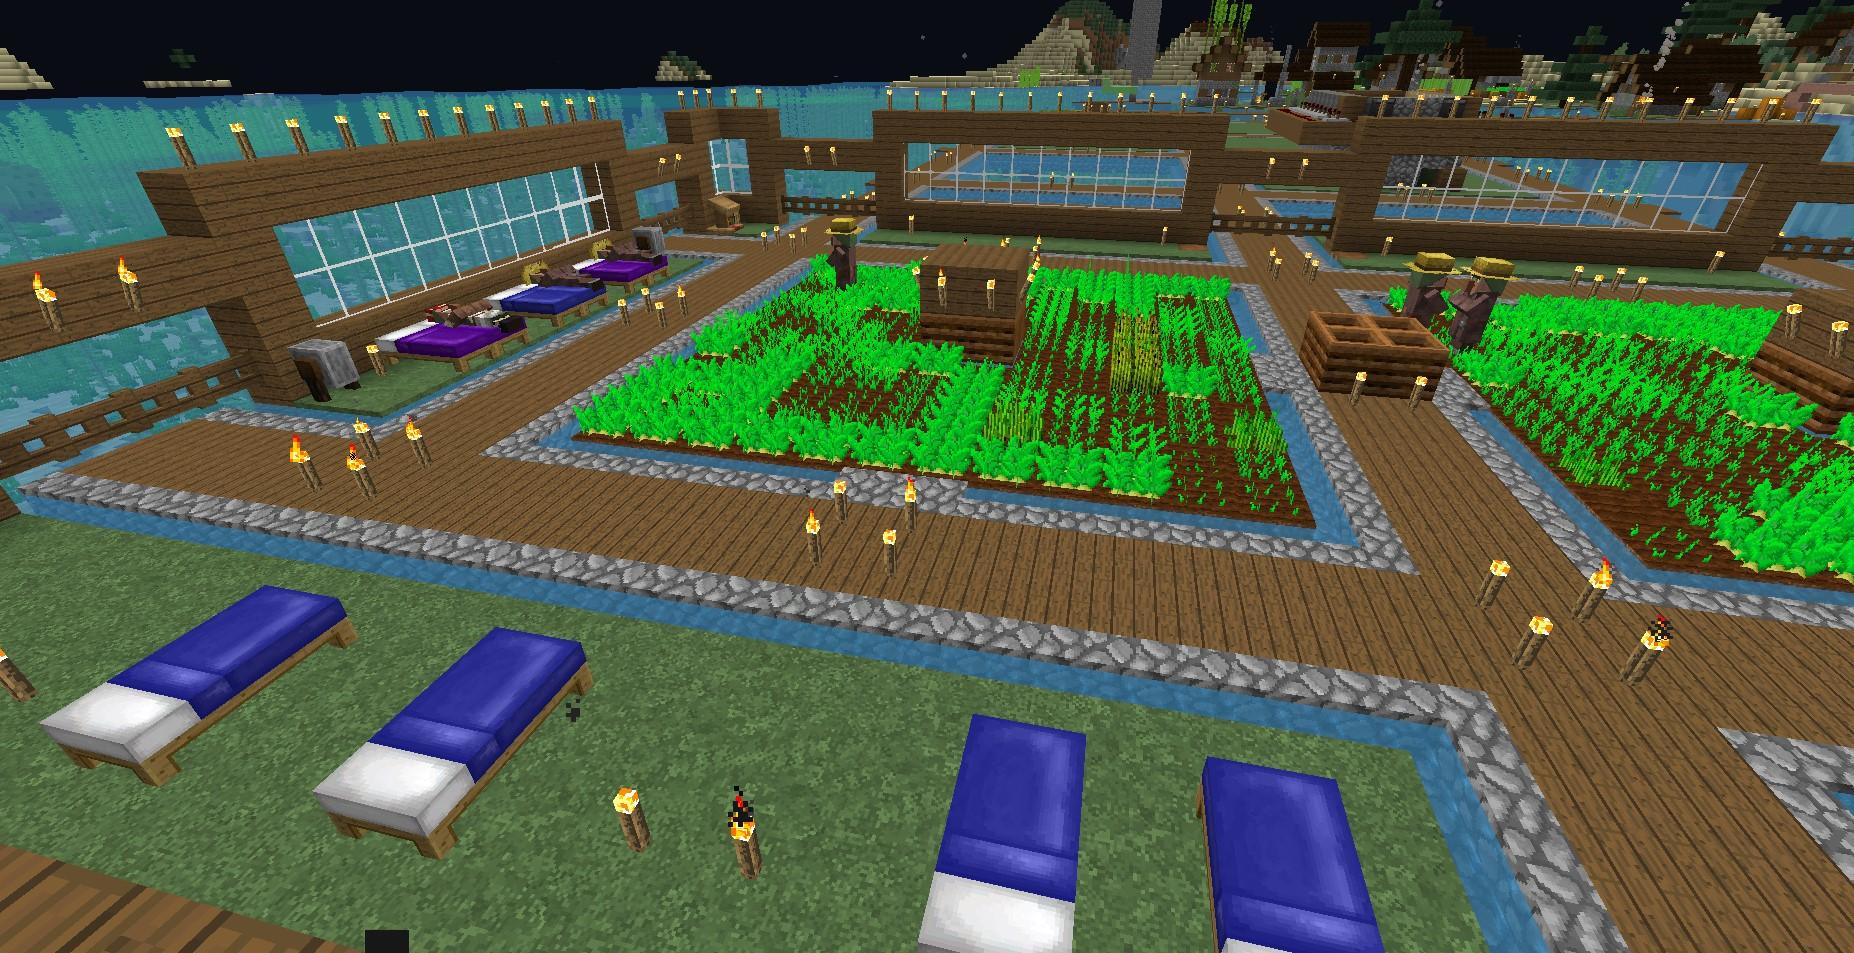 Villagers not breeding - Survival Mode - Minecraft: Java